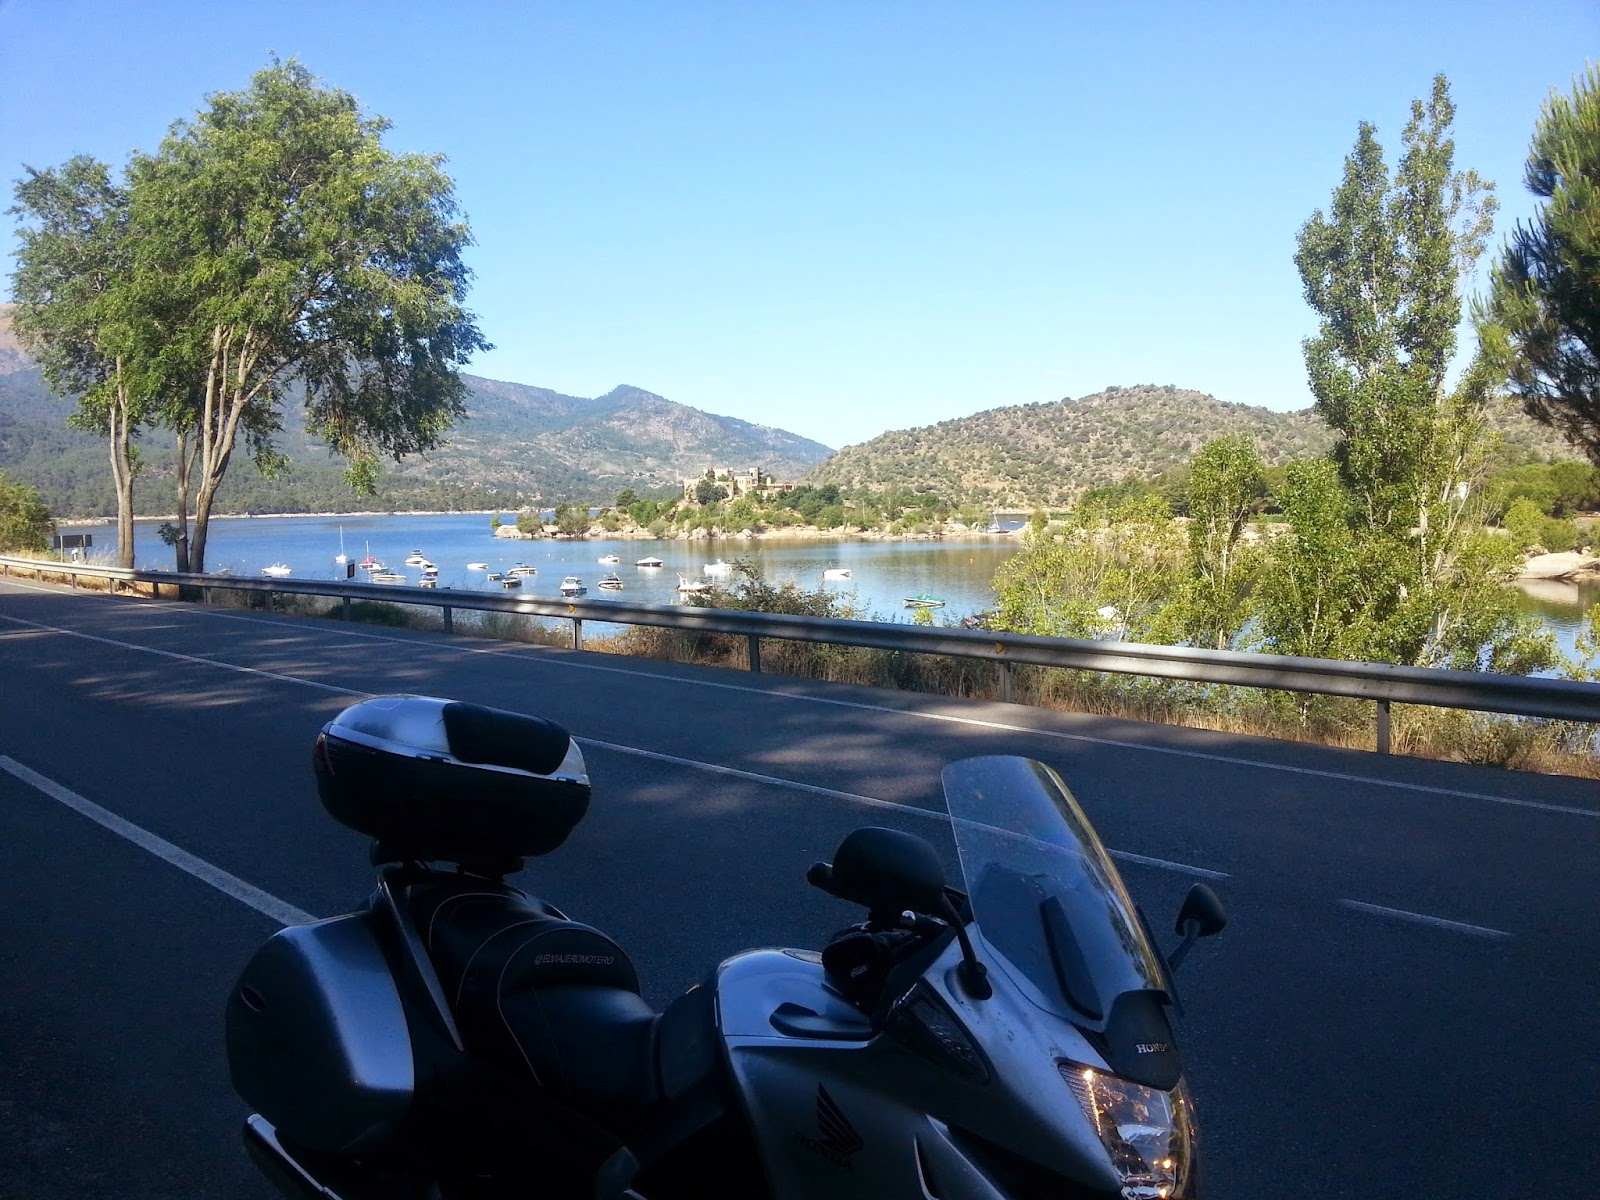 RUTA EN MOTO 505 Km LAS BATUECAS-SIERRA DE FRANCIA